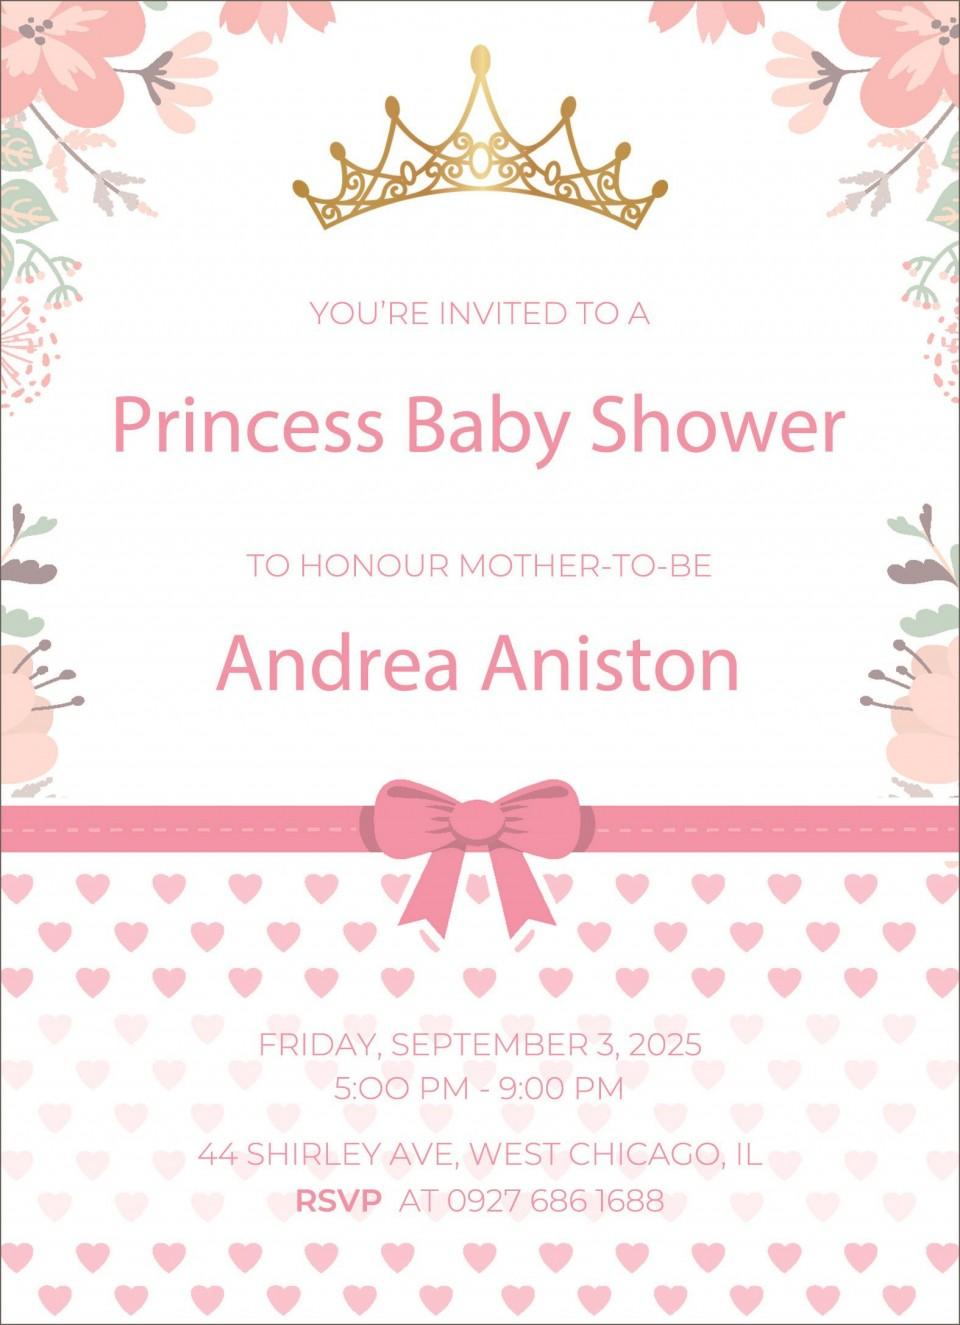 005 Shocking Microsoft Word Invitation Template Baby Shower Example  M Invite Free960